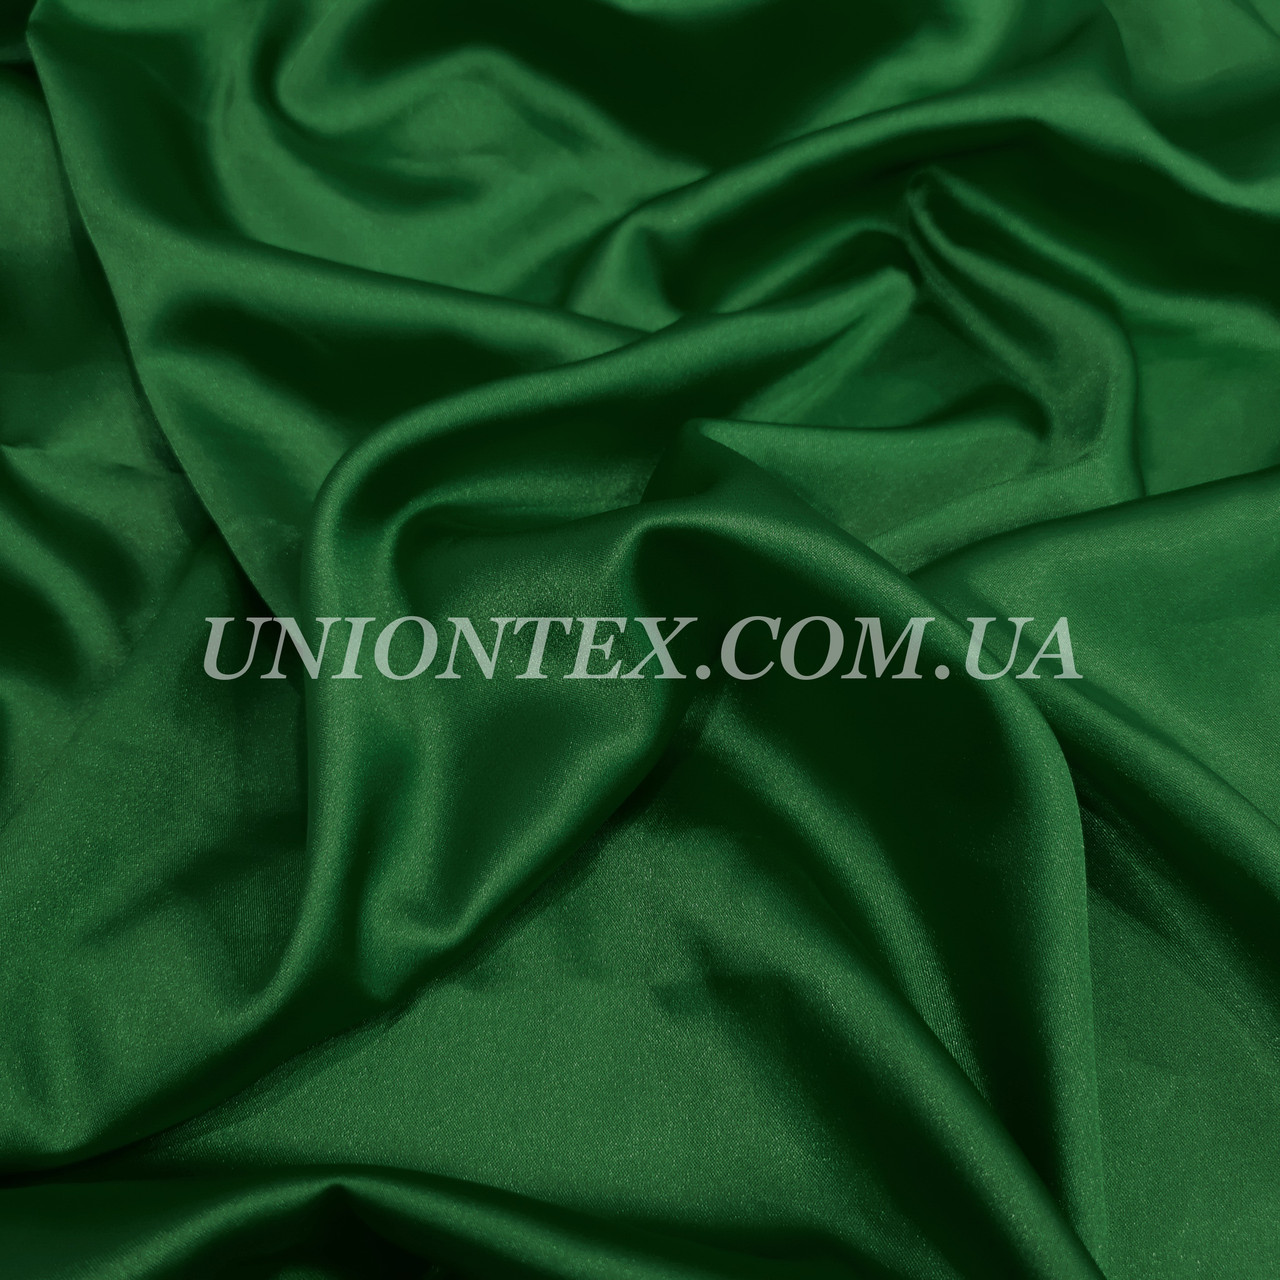 Ткань атлас стрейч темно-зеленый бутылка